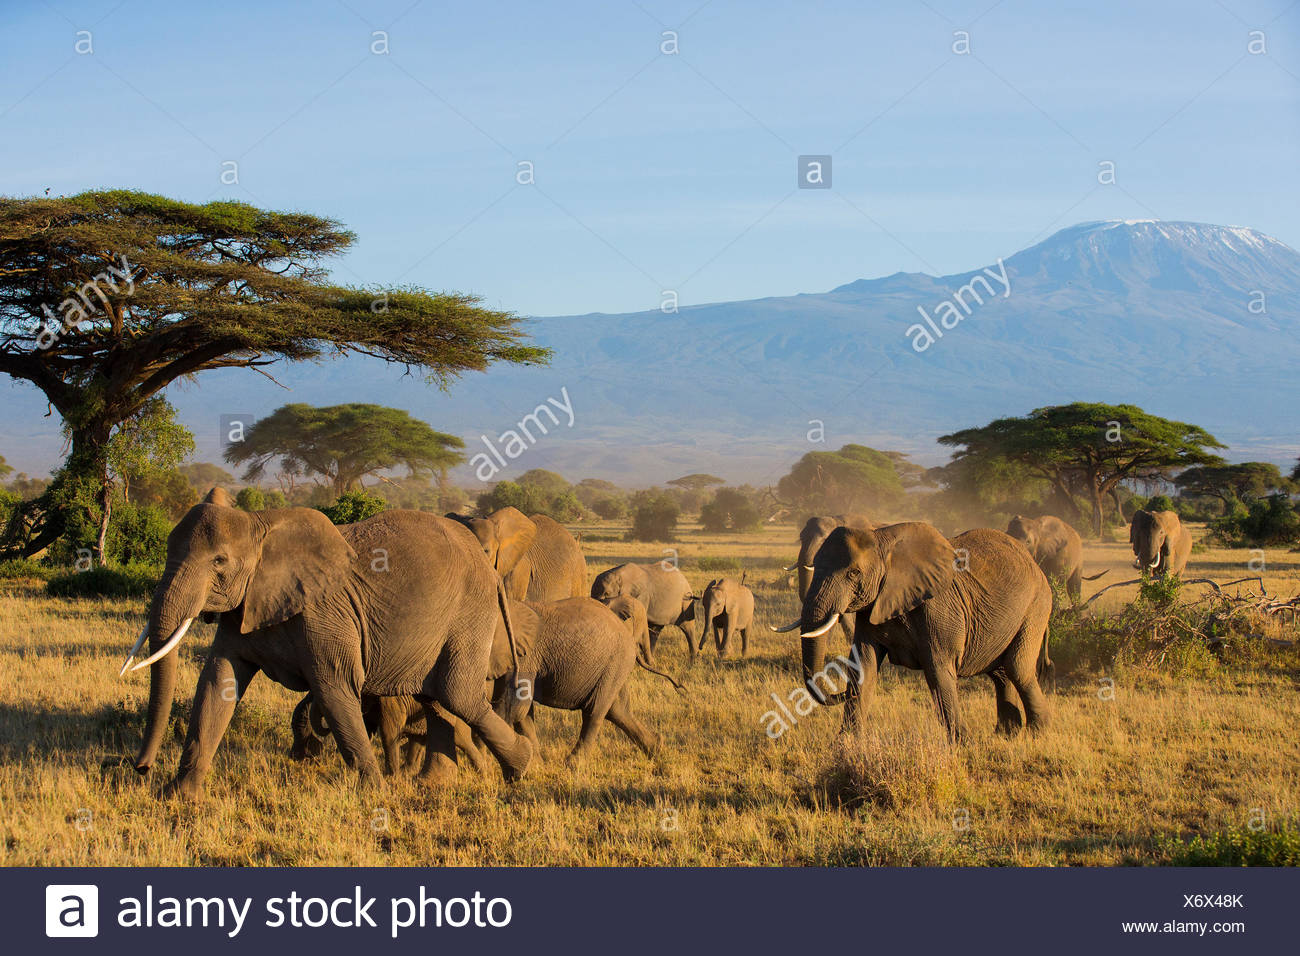 African Elephant (Loxodonta africana) Wandering herd at Amboseli National Park Kenya against Kilimandjaro - Stock Image